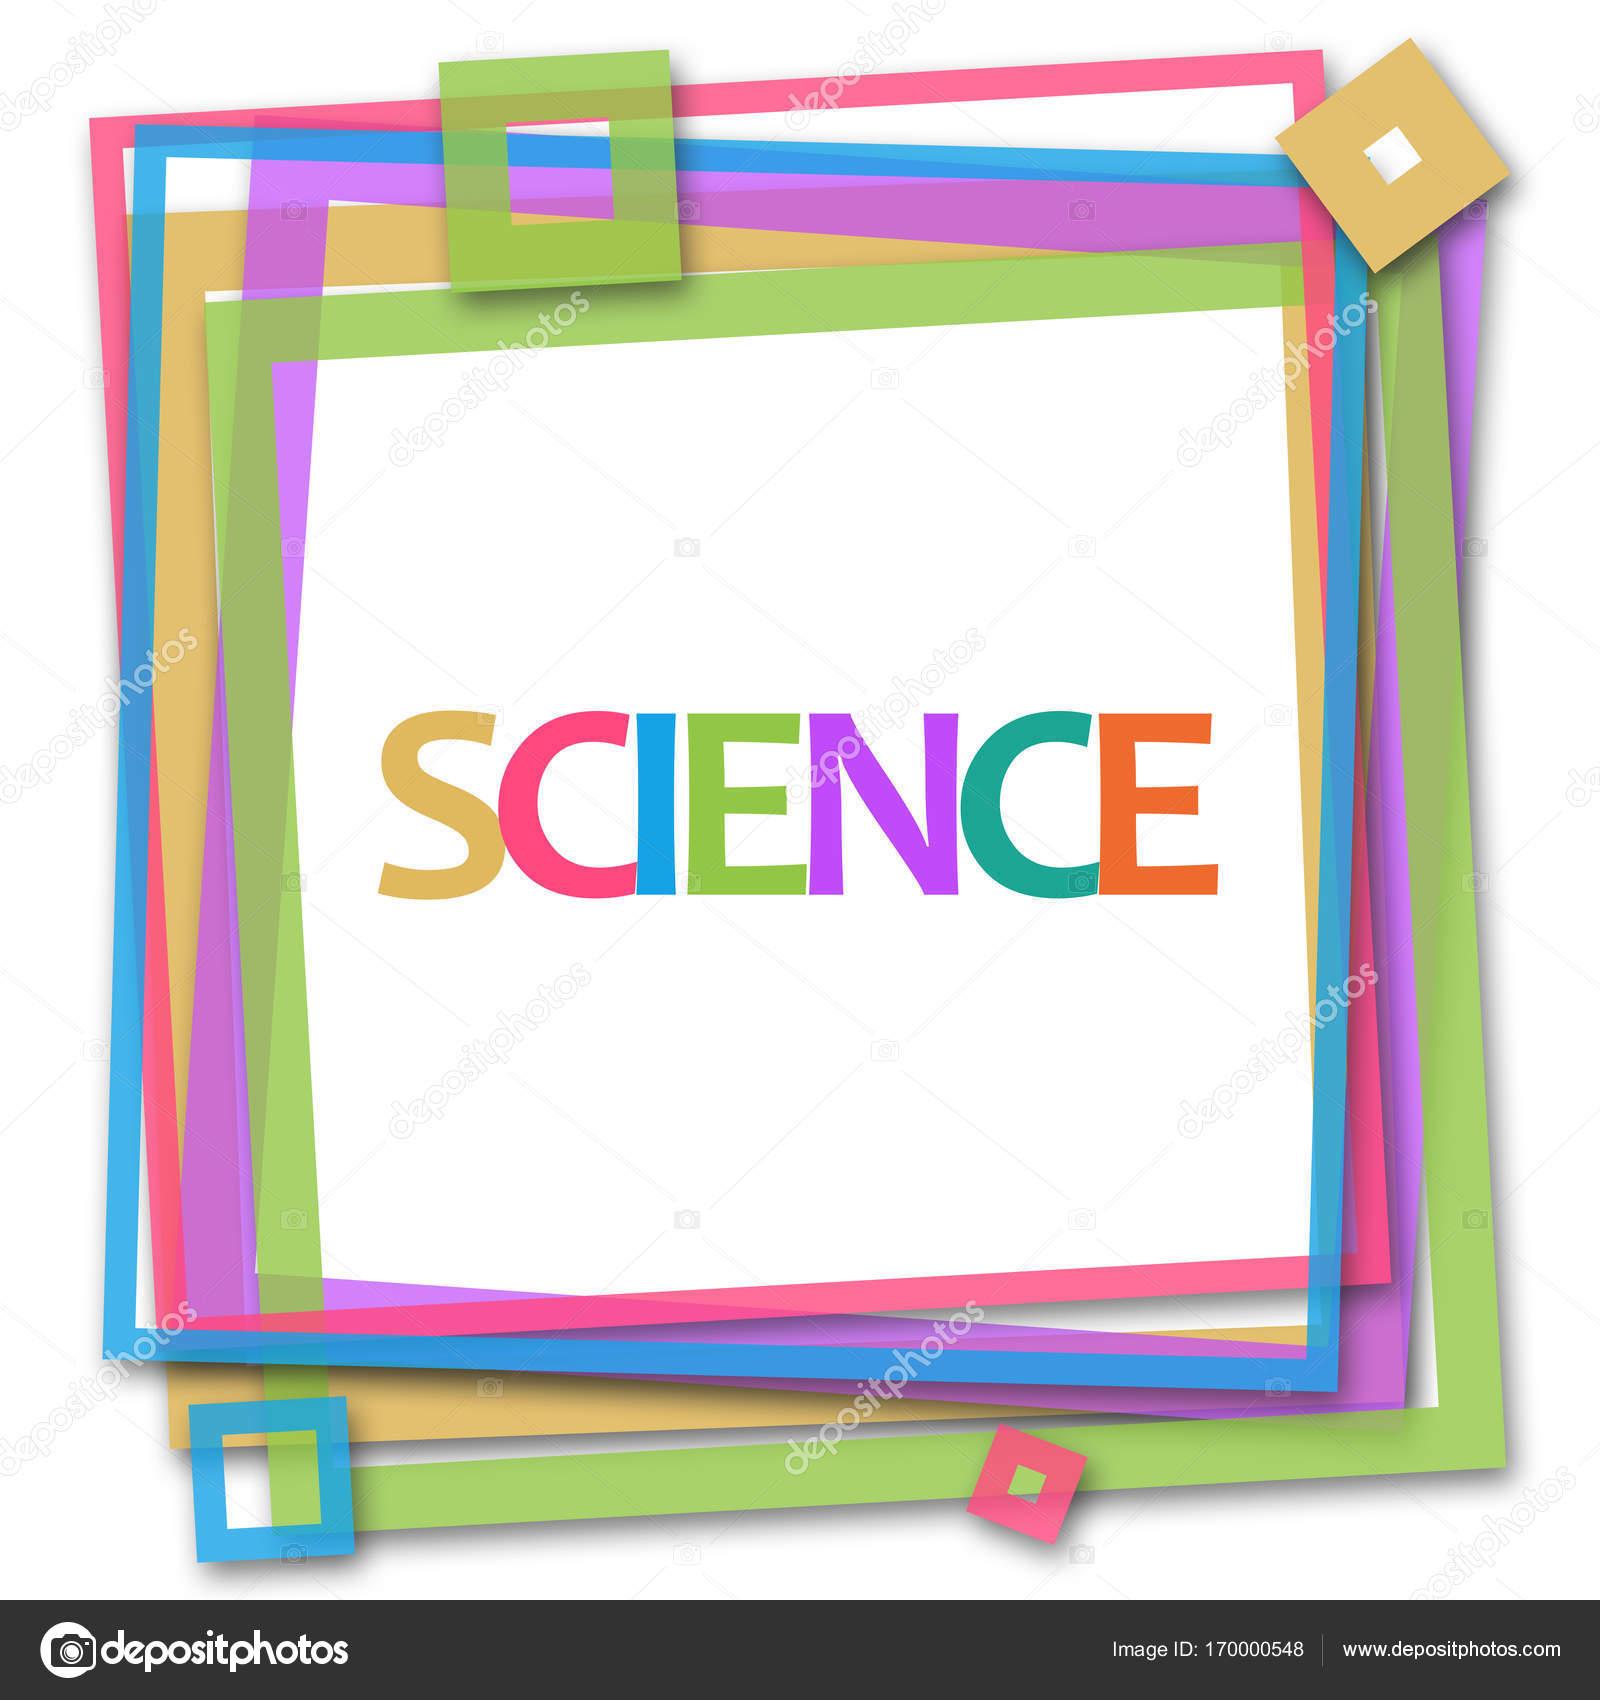 Science Colorful Frame — Stock Photo © ileezhun #170000548